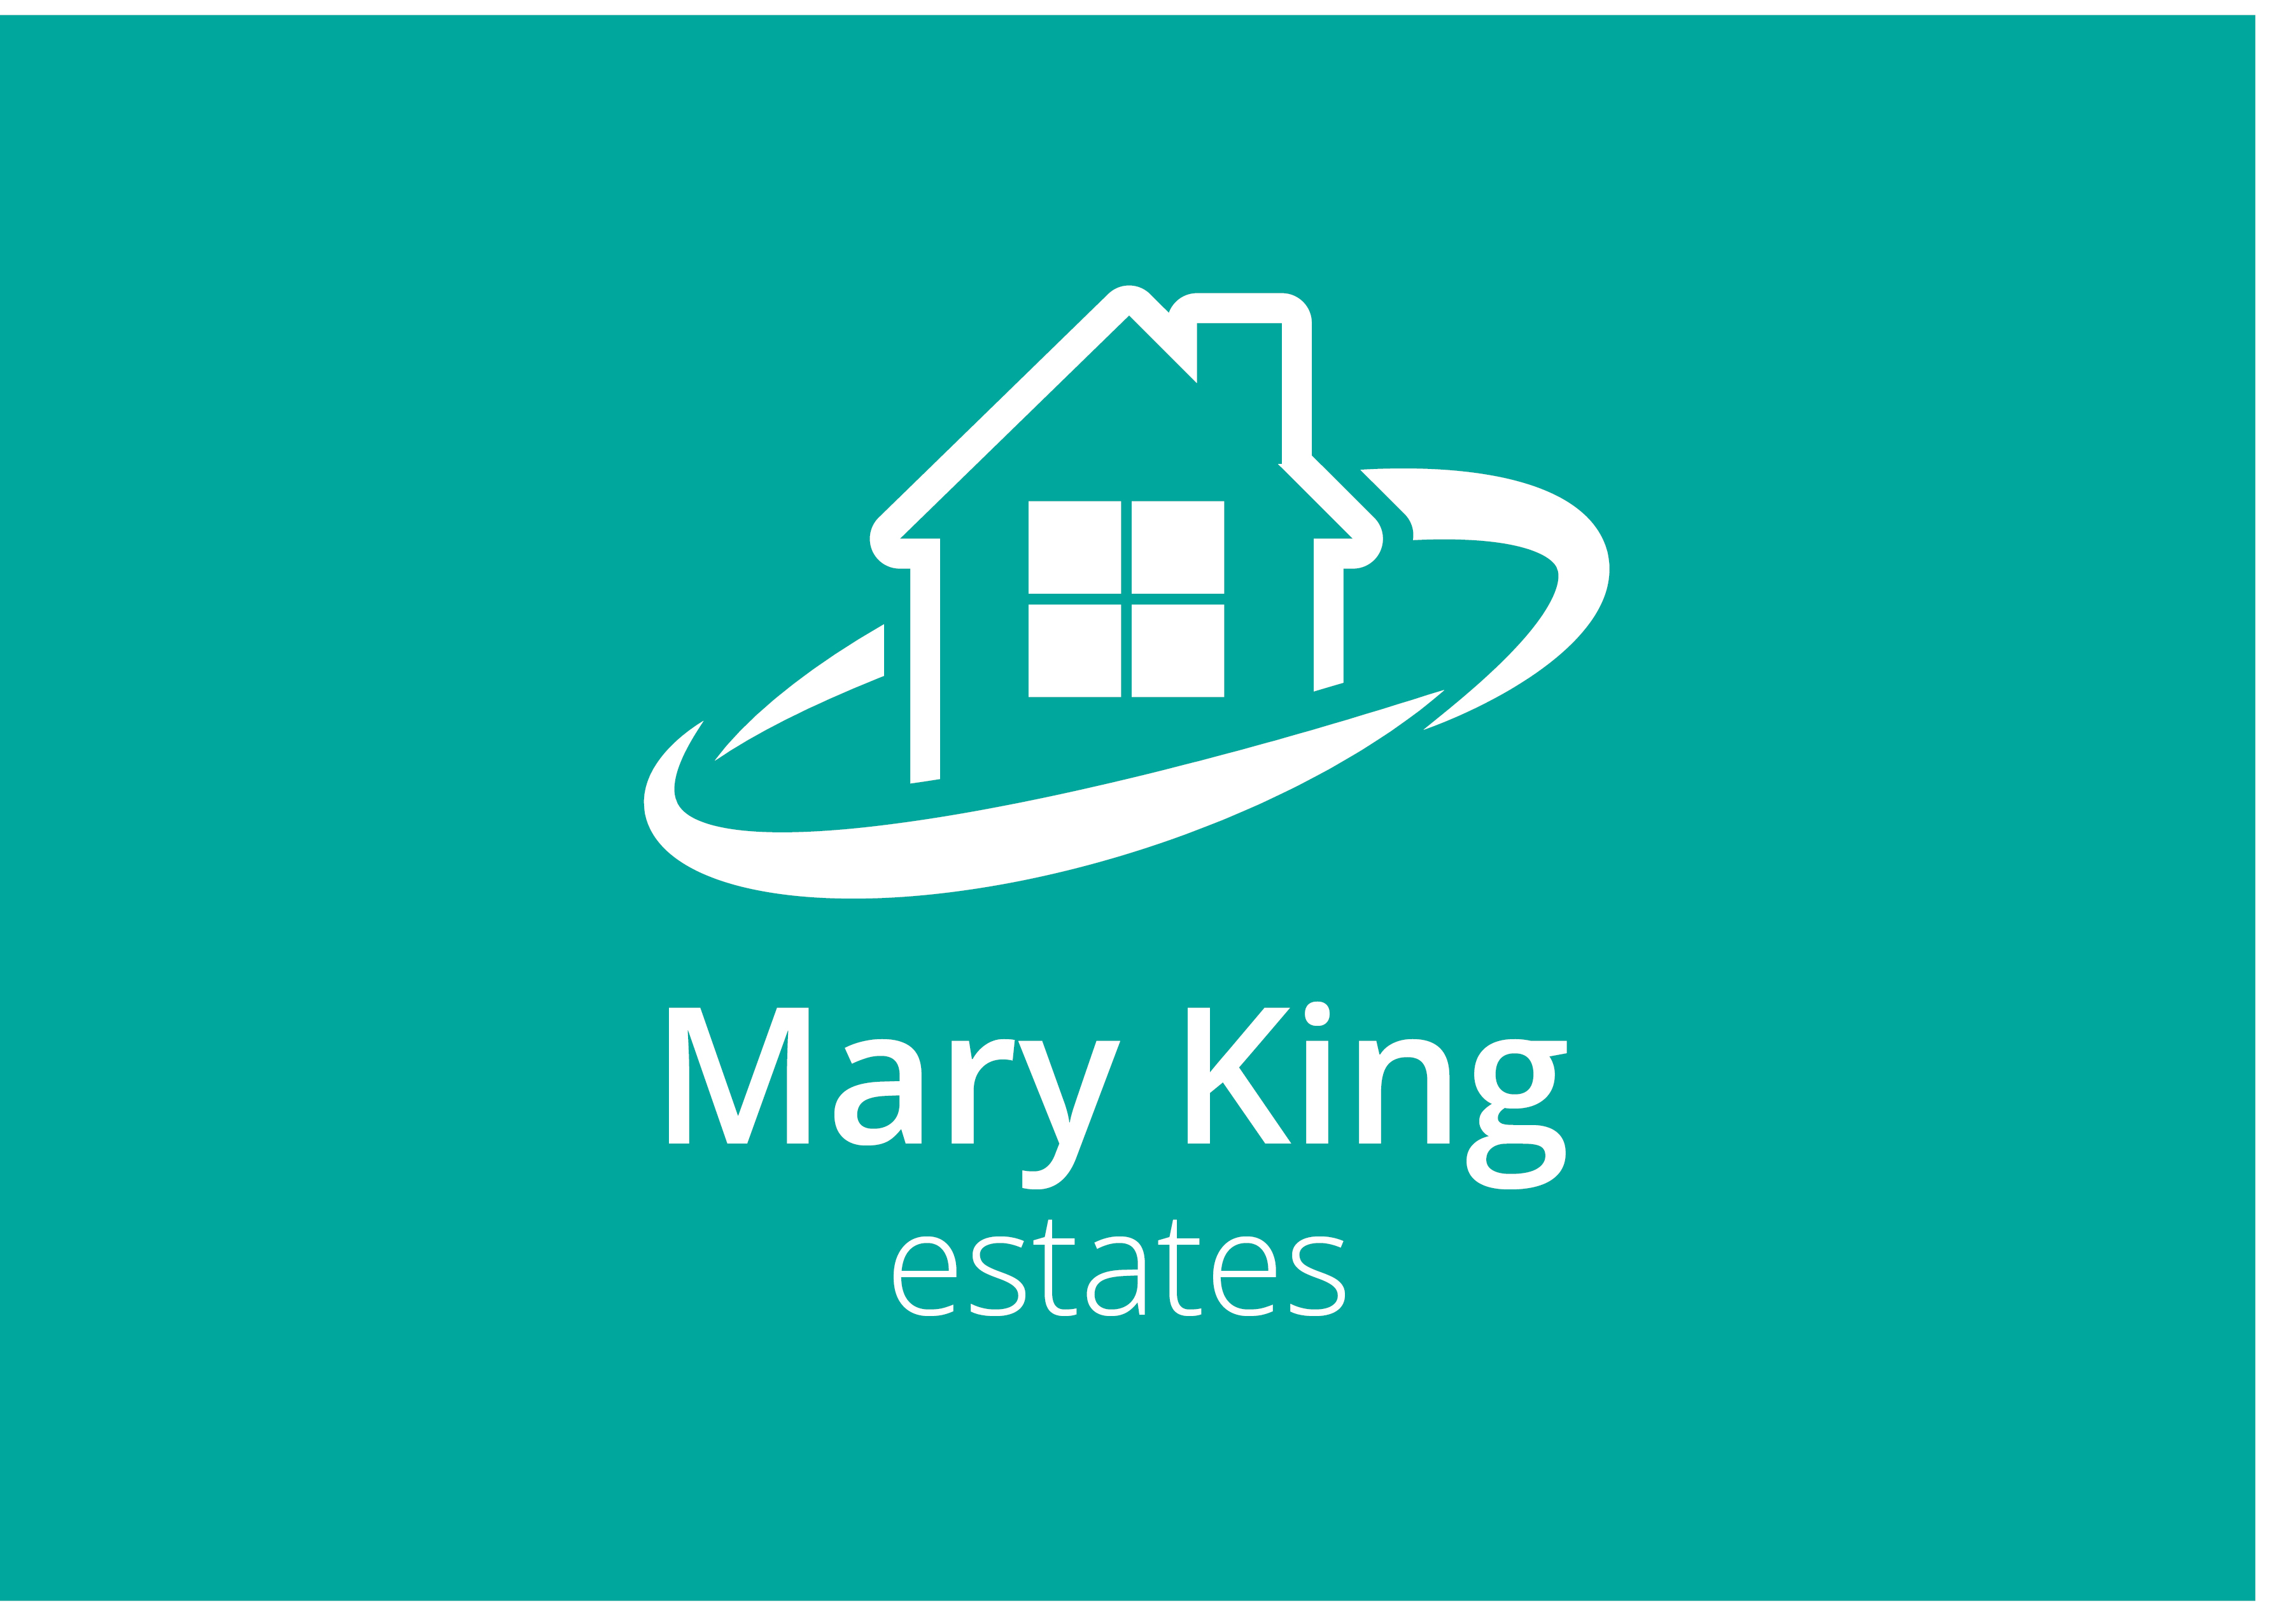 Mary King Estates